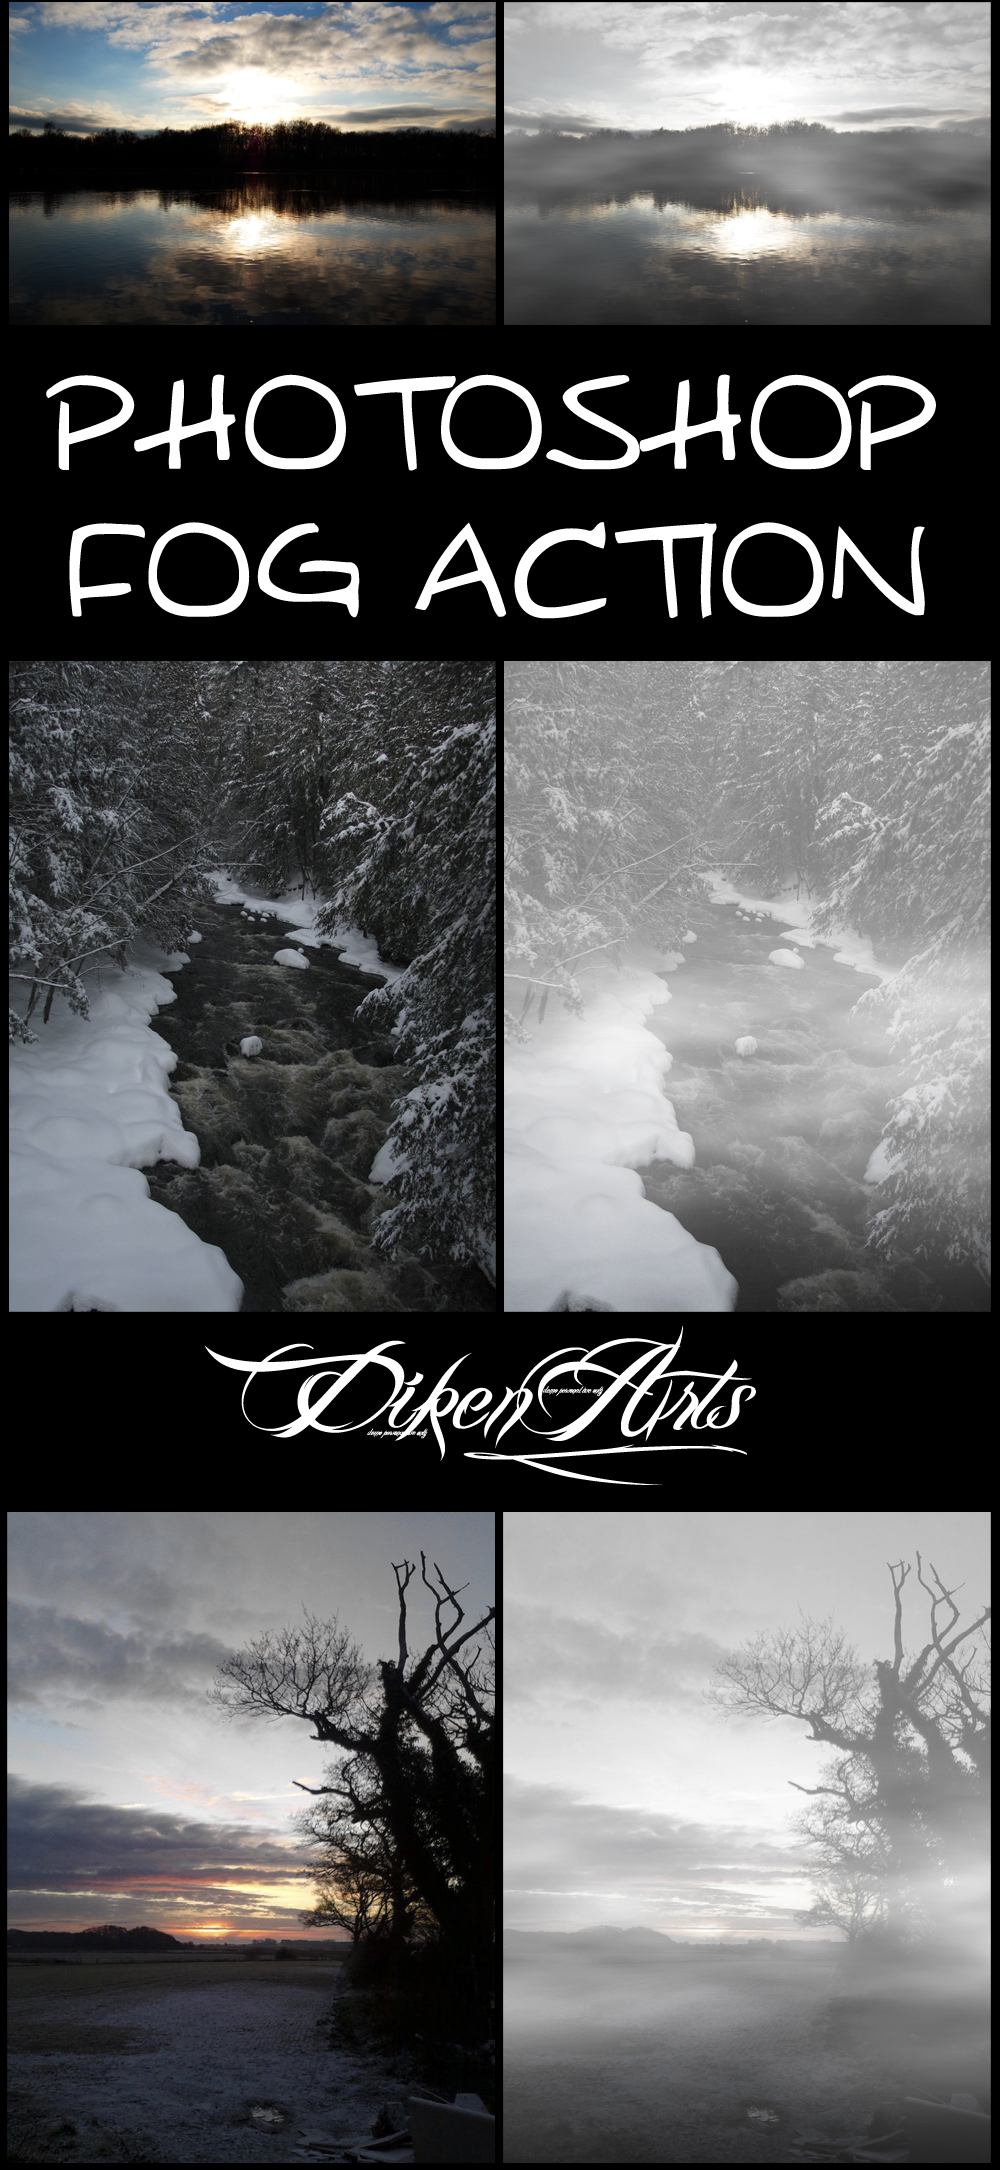 Photoshop Fog Action by ysndkn on DeviantArt